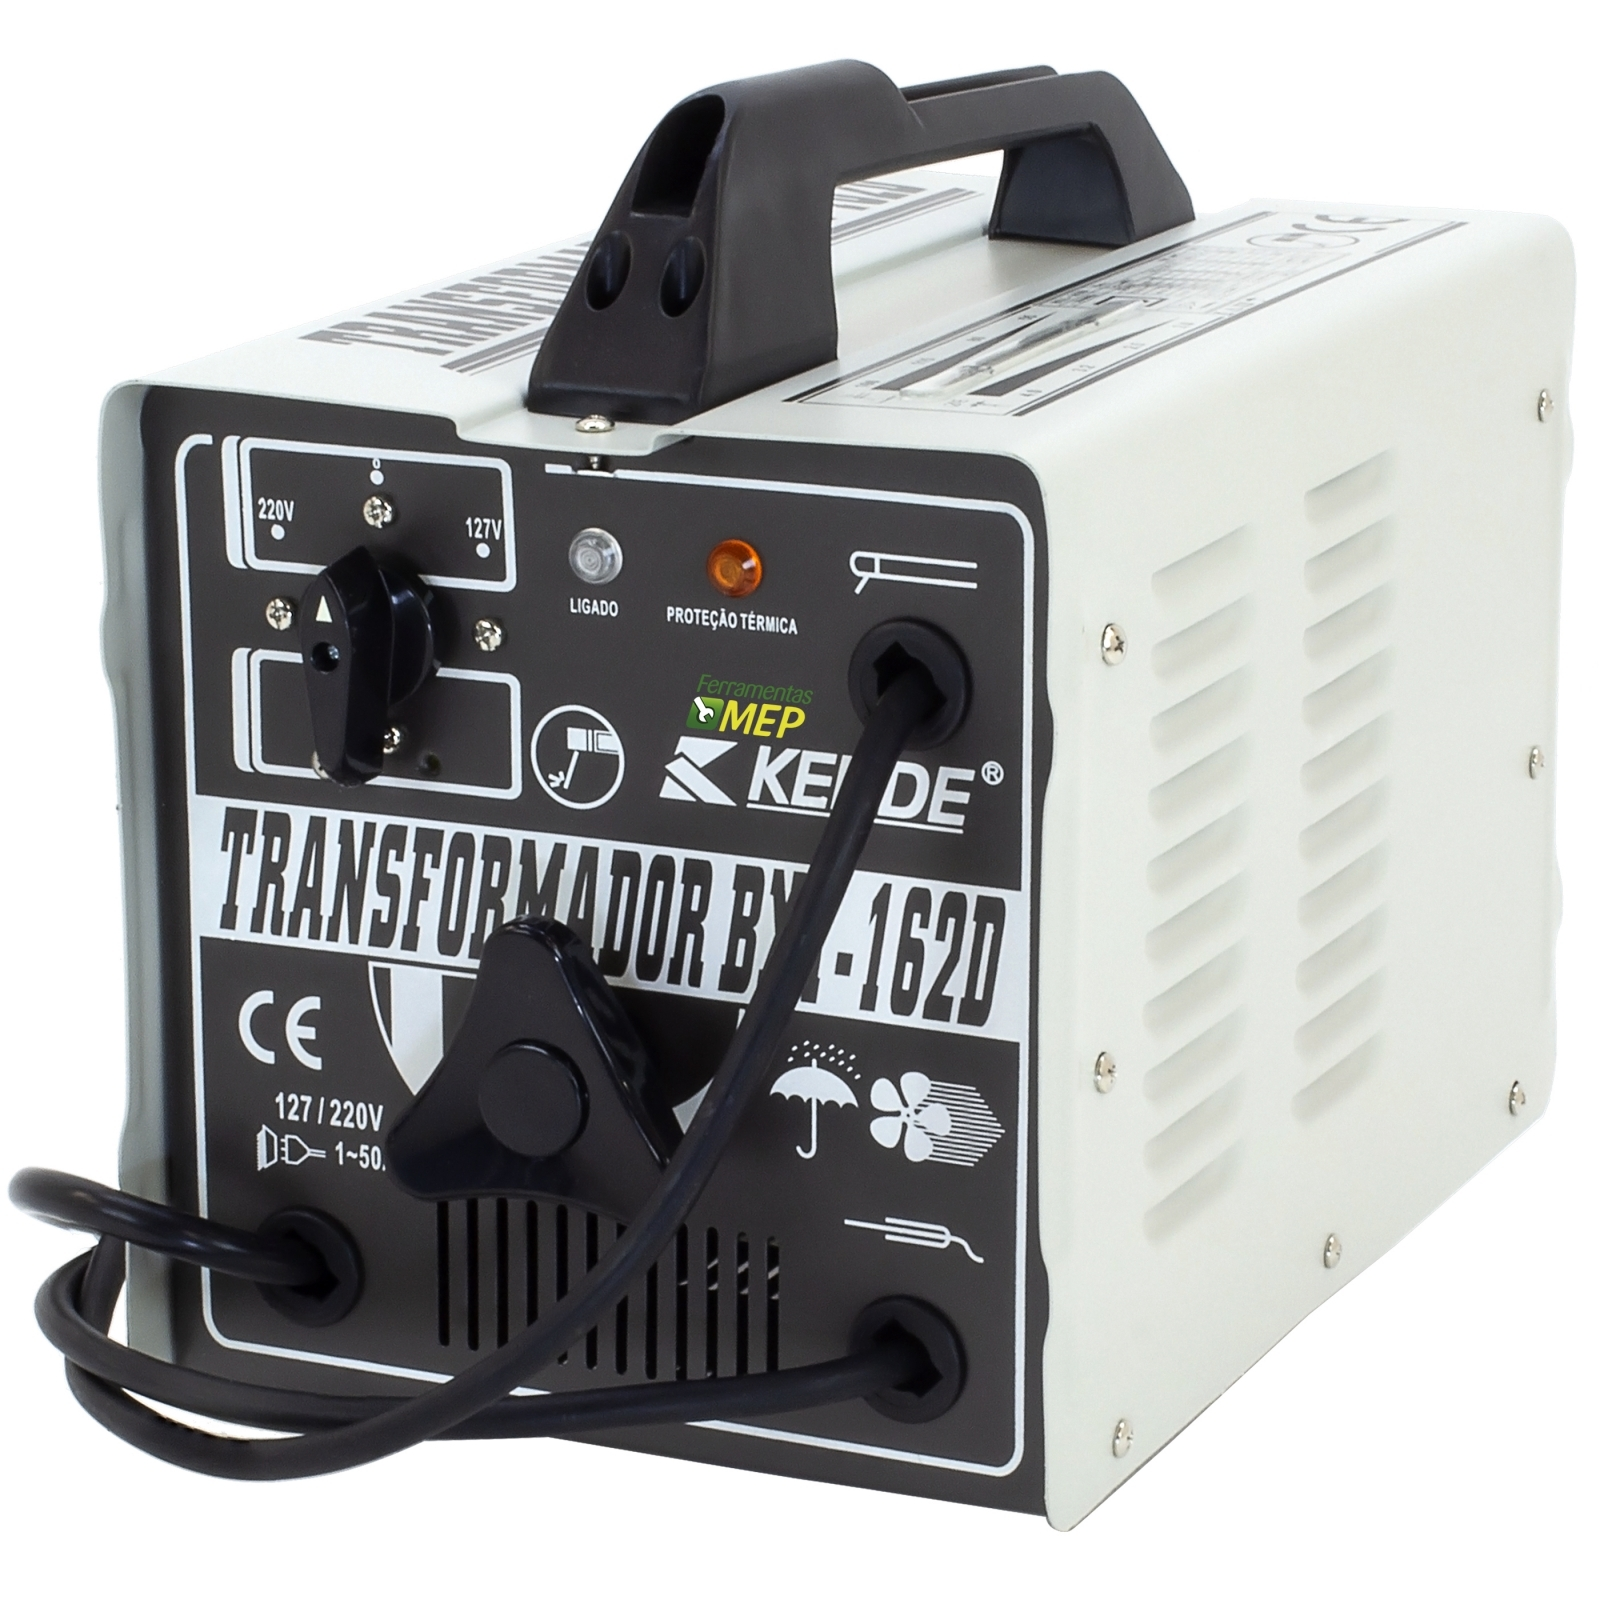 Máquina de Solda Transformador Kende 160 Amperes Sk3  - Ferramentas MEP